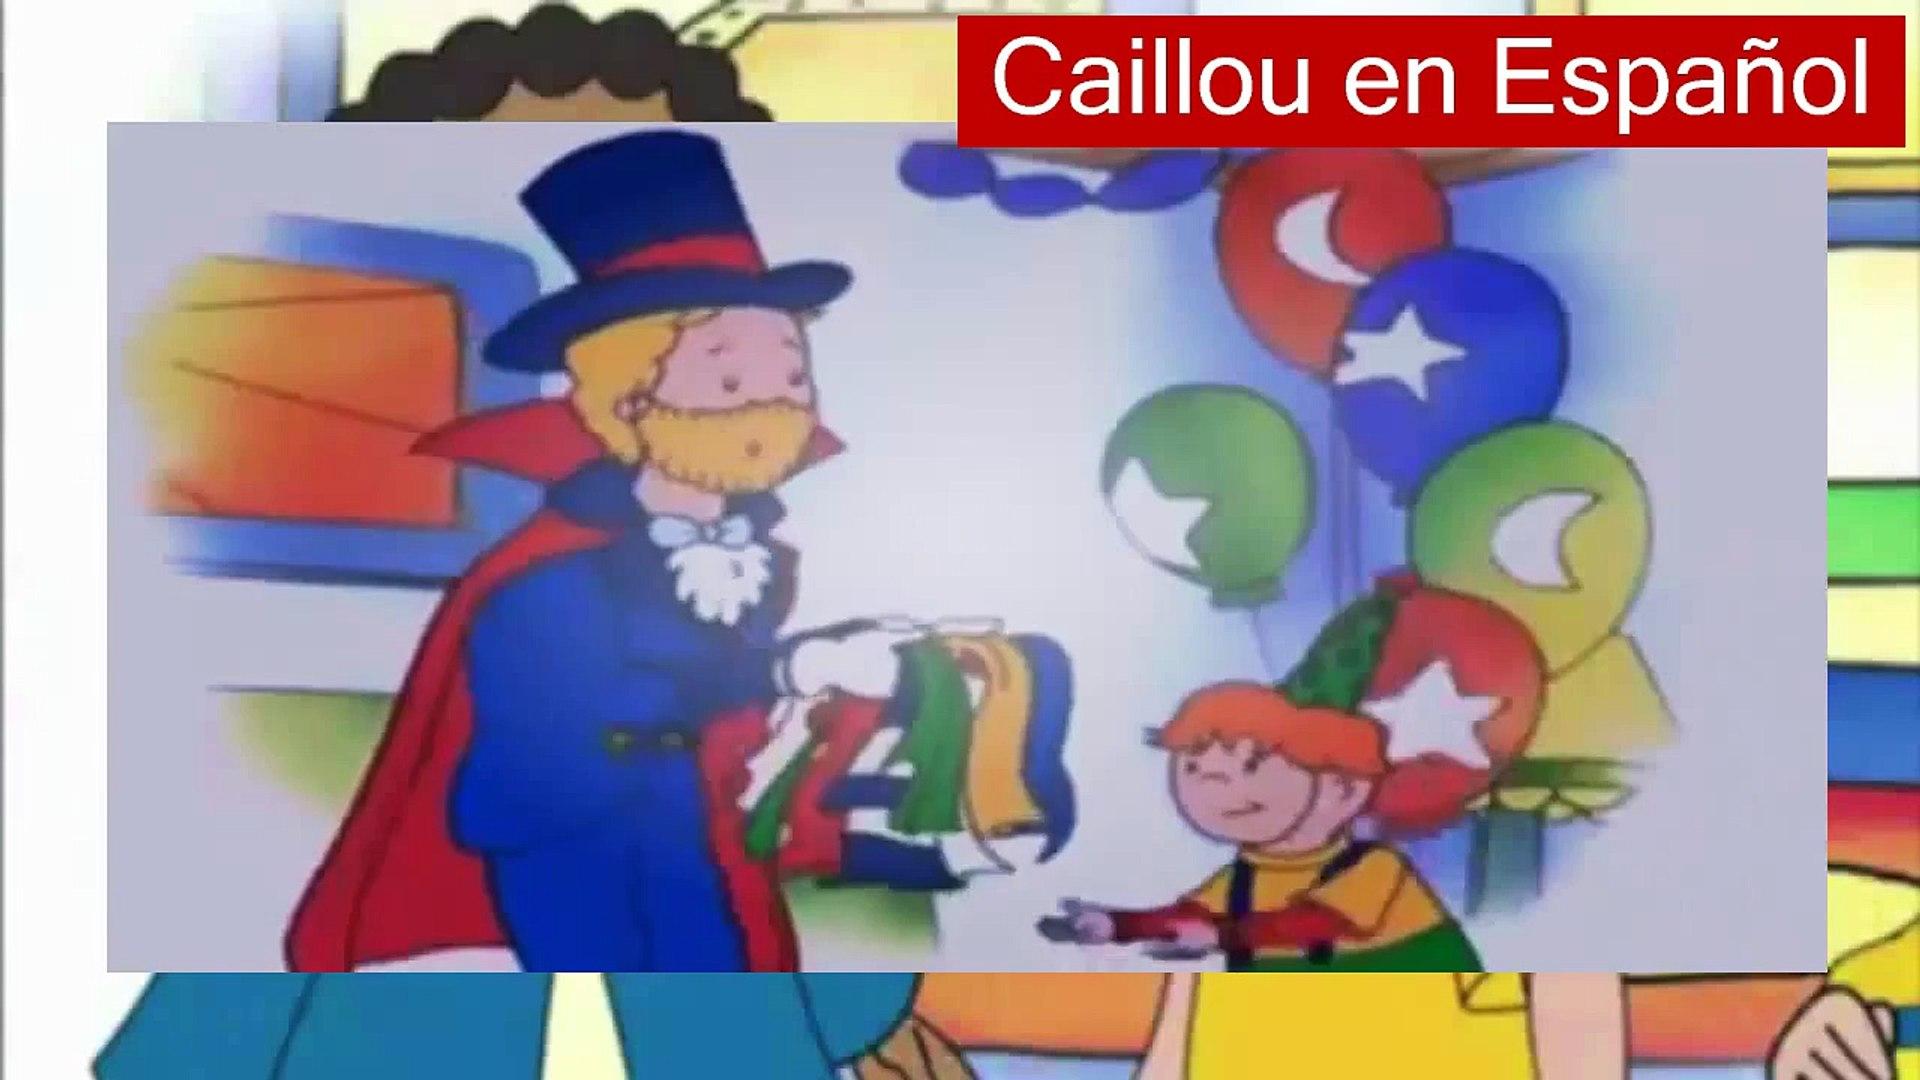 Caillou Weihnachten.Caillou Deutsch Frosch Im Hals Der Grosse Caillou